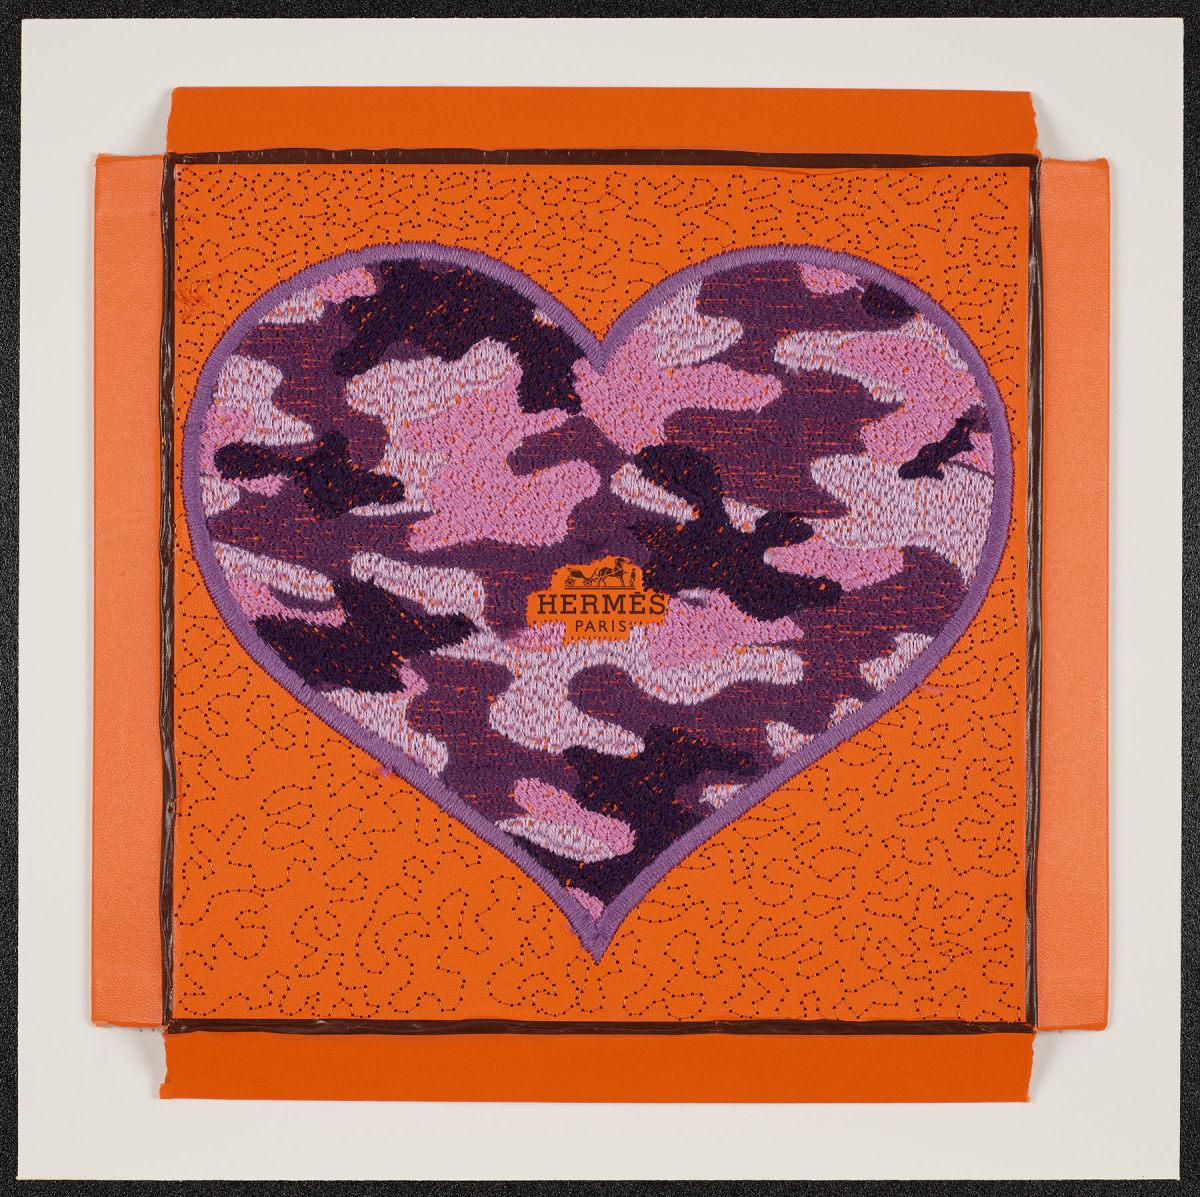 Stephen Wilson, Hermes Camo Heart (Flat Purple), 2020